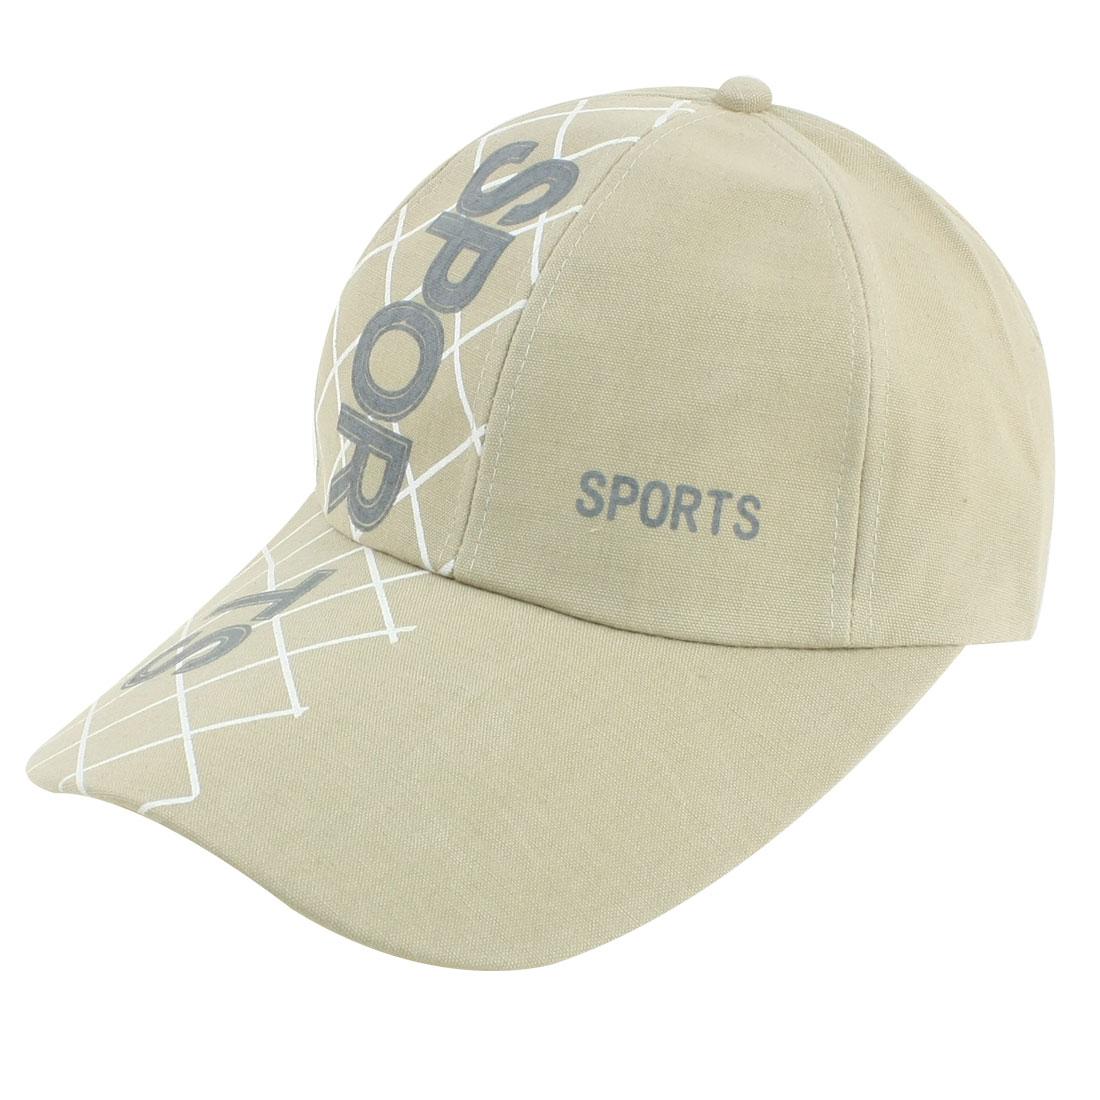 Man Women Adjustable Letter Pattern Casquette Style Sun Visor Hat Cap Khaki